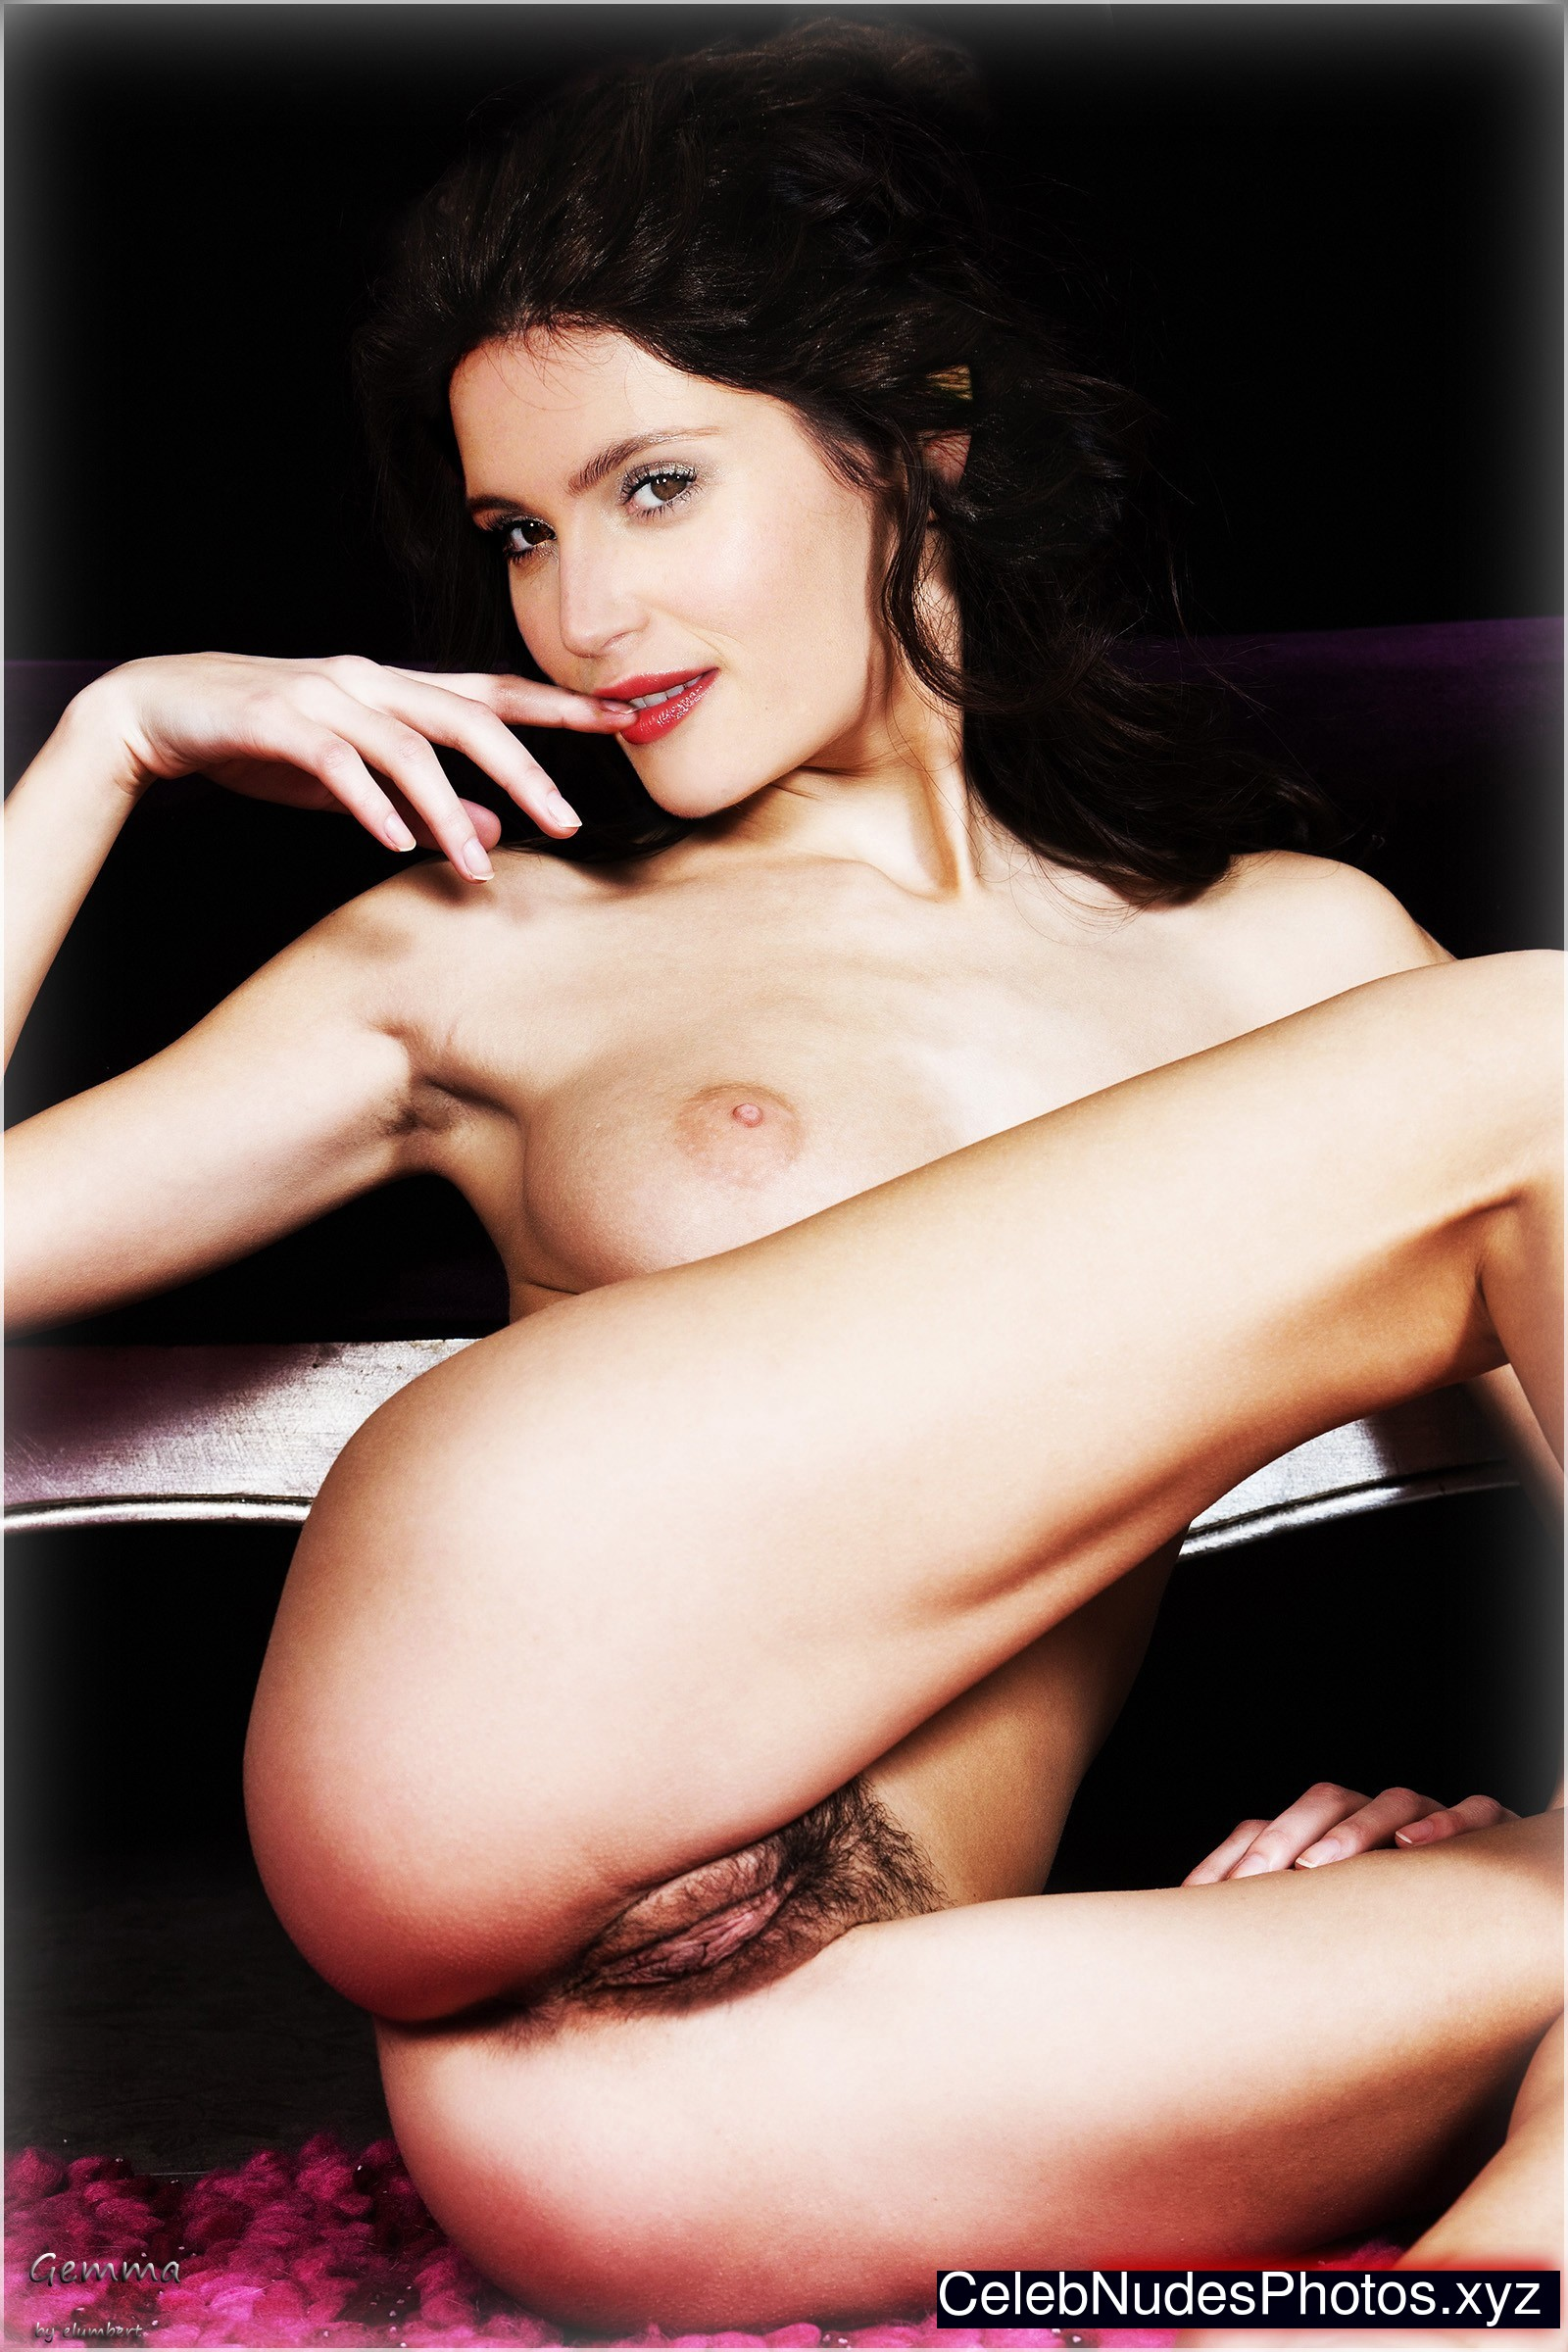 Kelli berglund naked porn